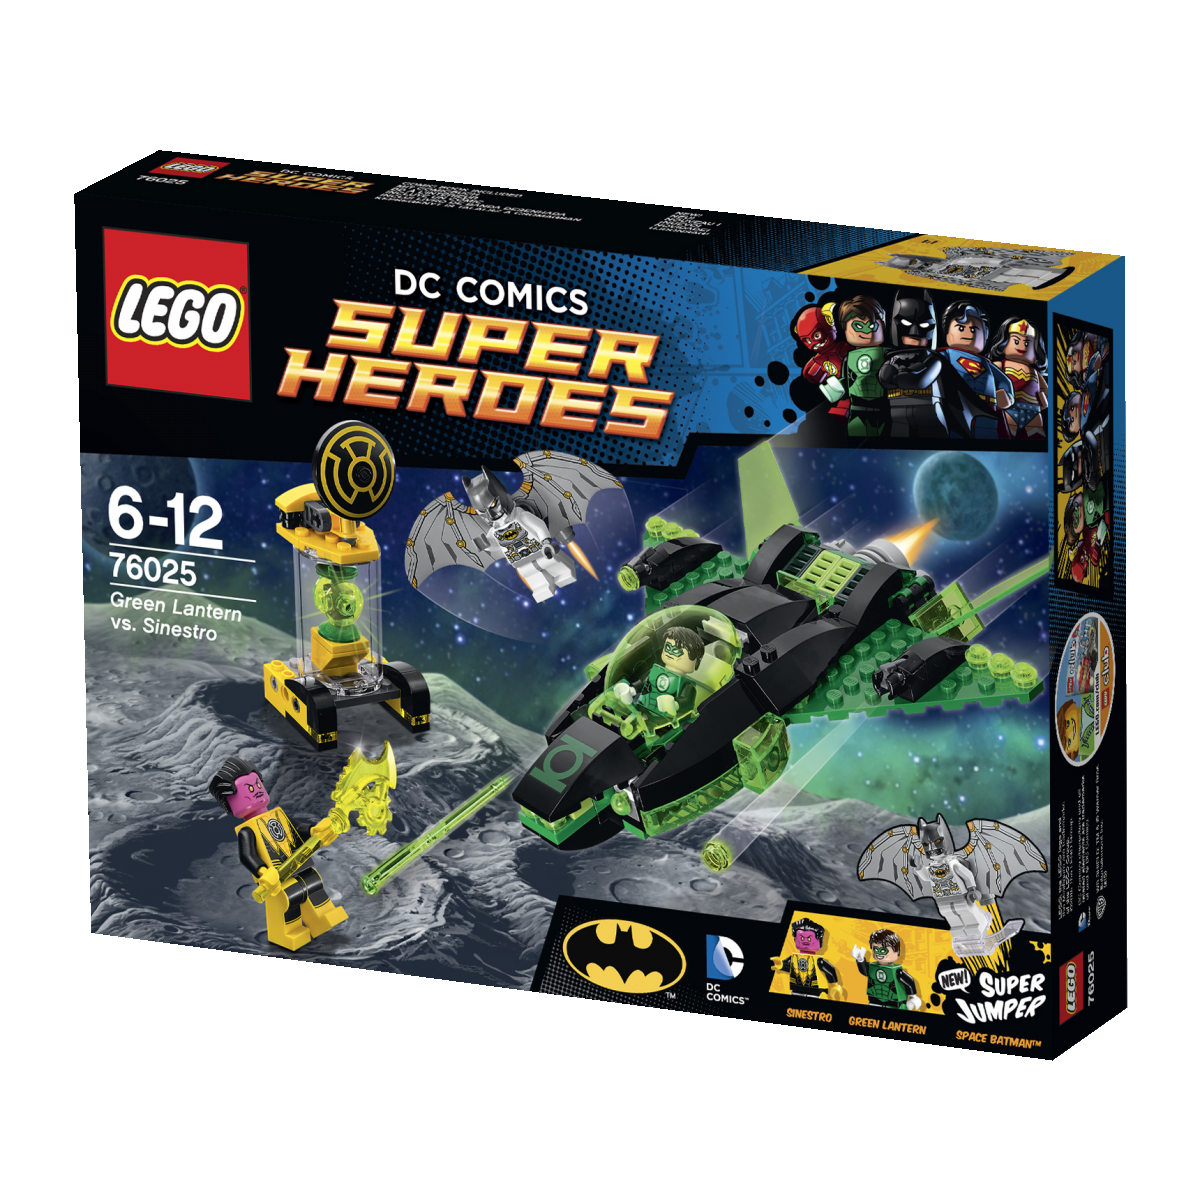 6 Malvorlagen Lego Superheroes: The Minifigure Collector: 2015 DC Super Heroes Sets